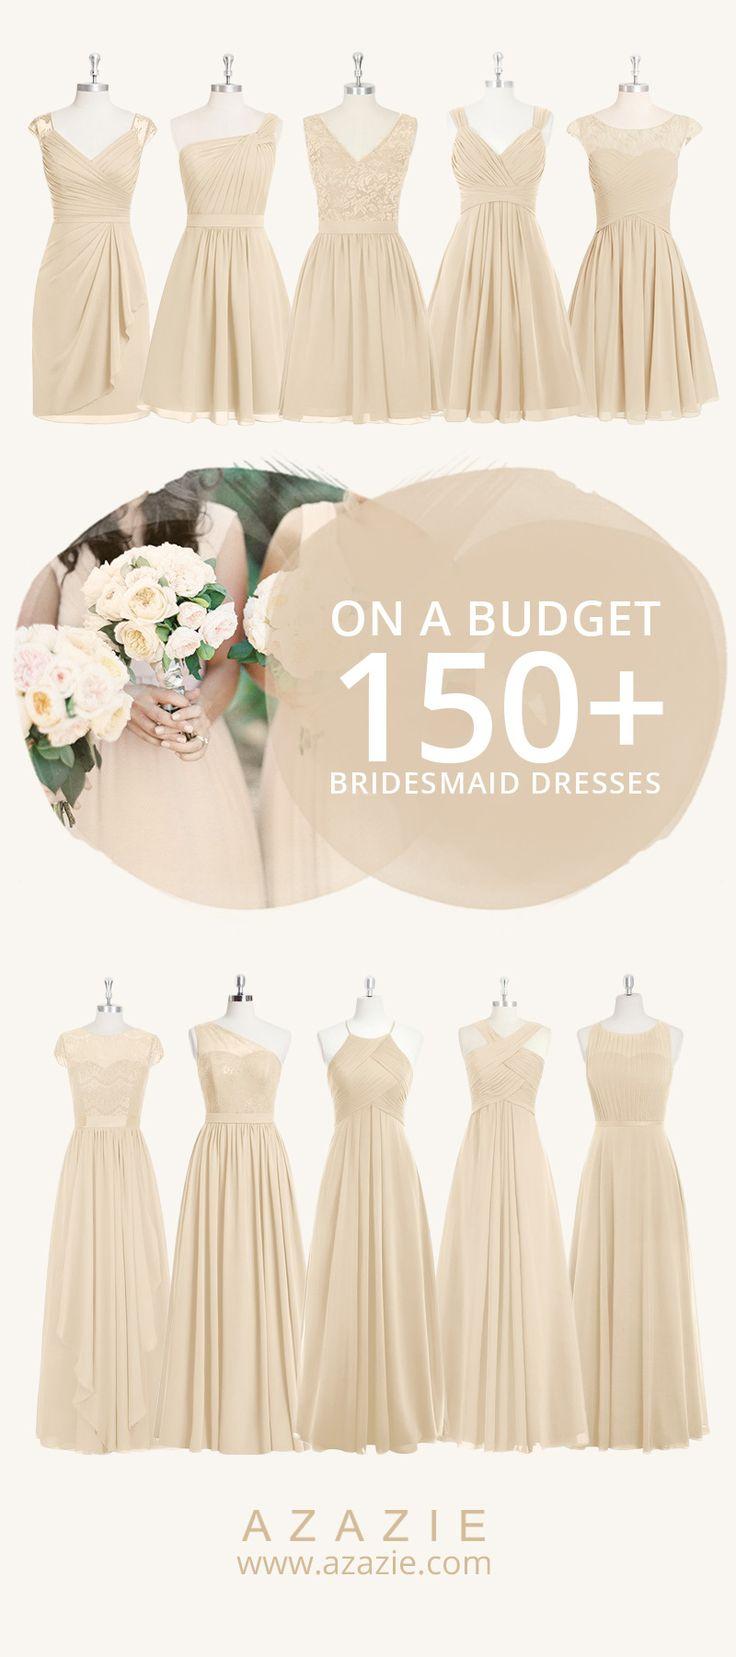 Brides Our Bridesmaids Dresses Special 44